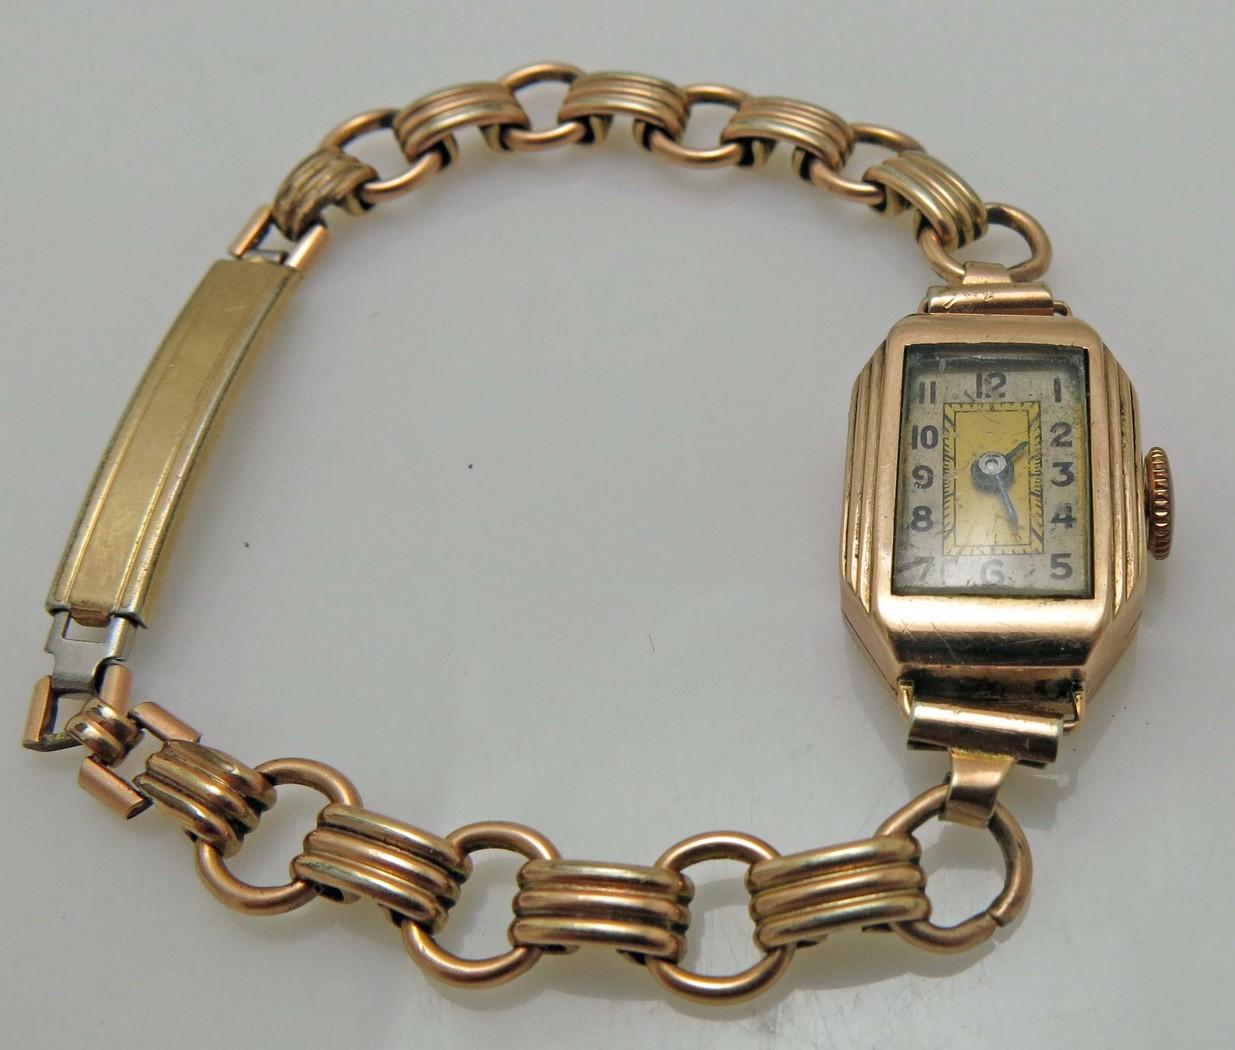 Amex Car Buying >> Vintage 9ct Gold Handley Brand - Lot 857522   ALLBIDS